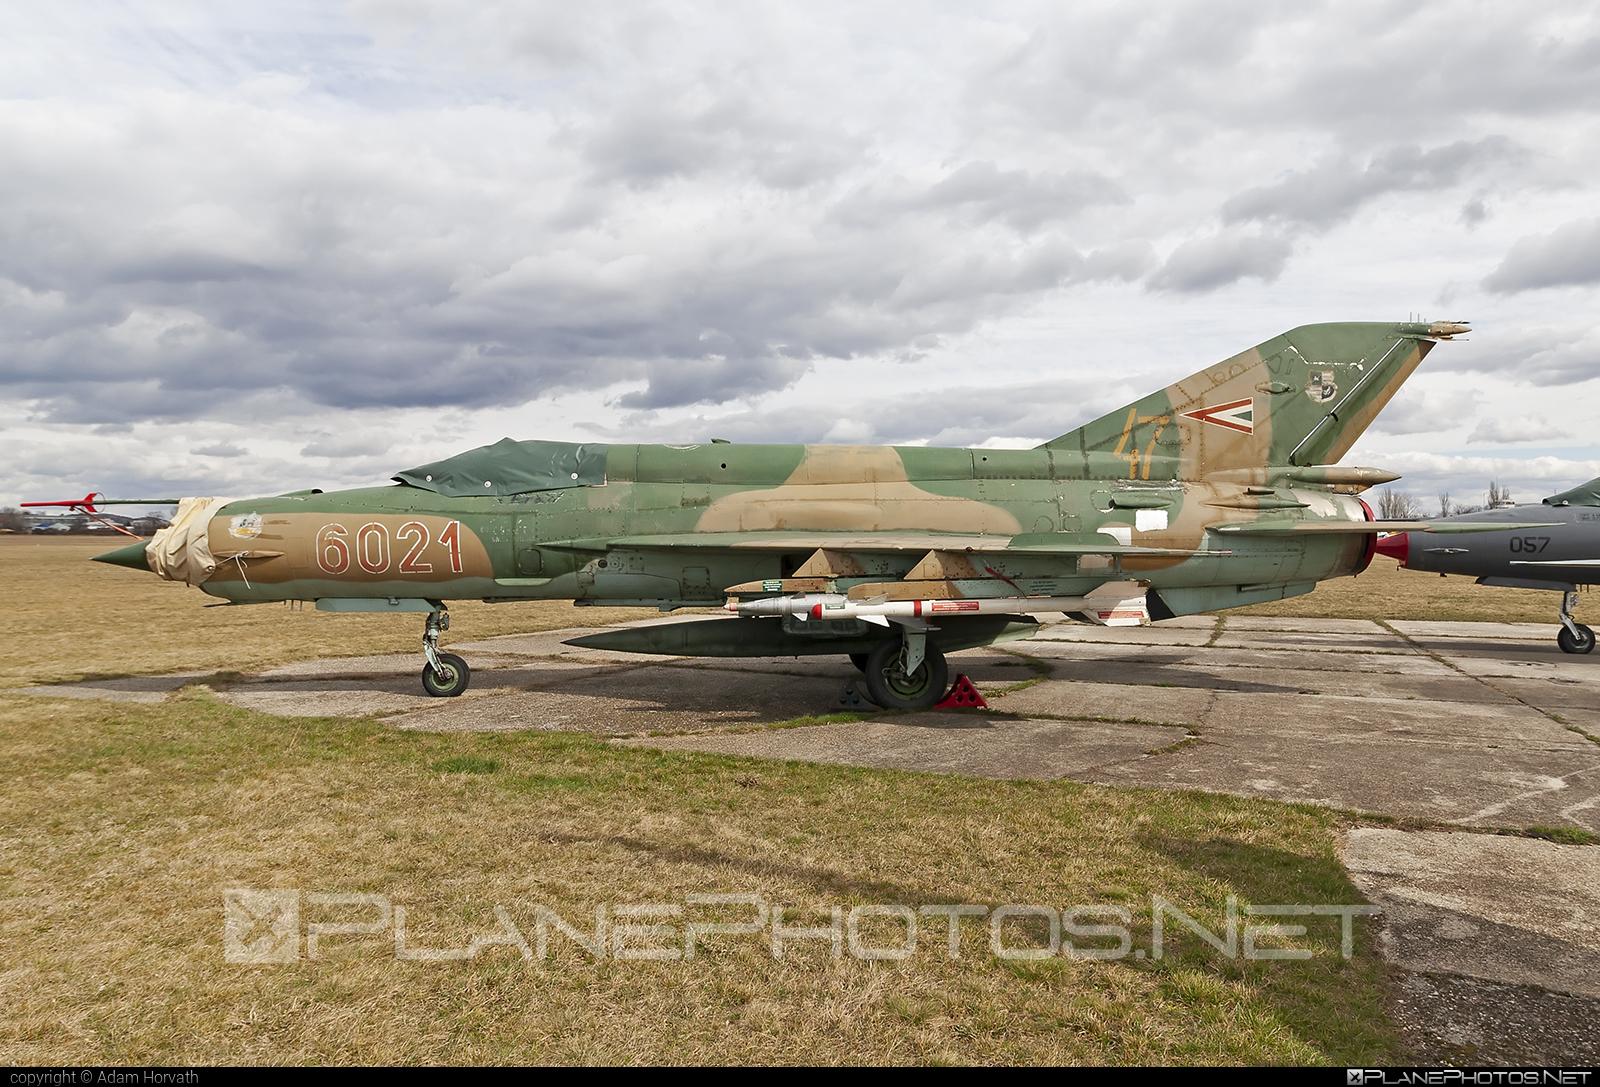 Magyar Légierő (Hungarian Air Force) Mikoyan-Gurevich MiG-21bis - 6021 #hungarianairforce #magyarlegiero #mig #mig21 #mig21bis #mikoyangurevich